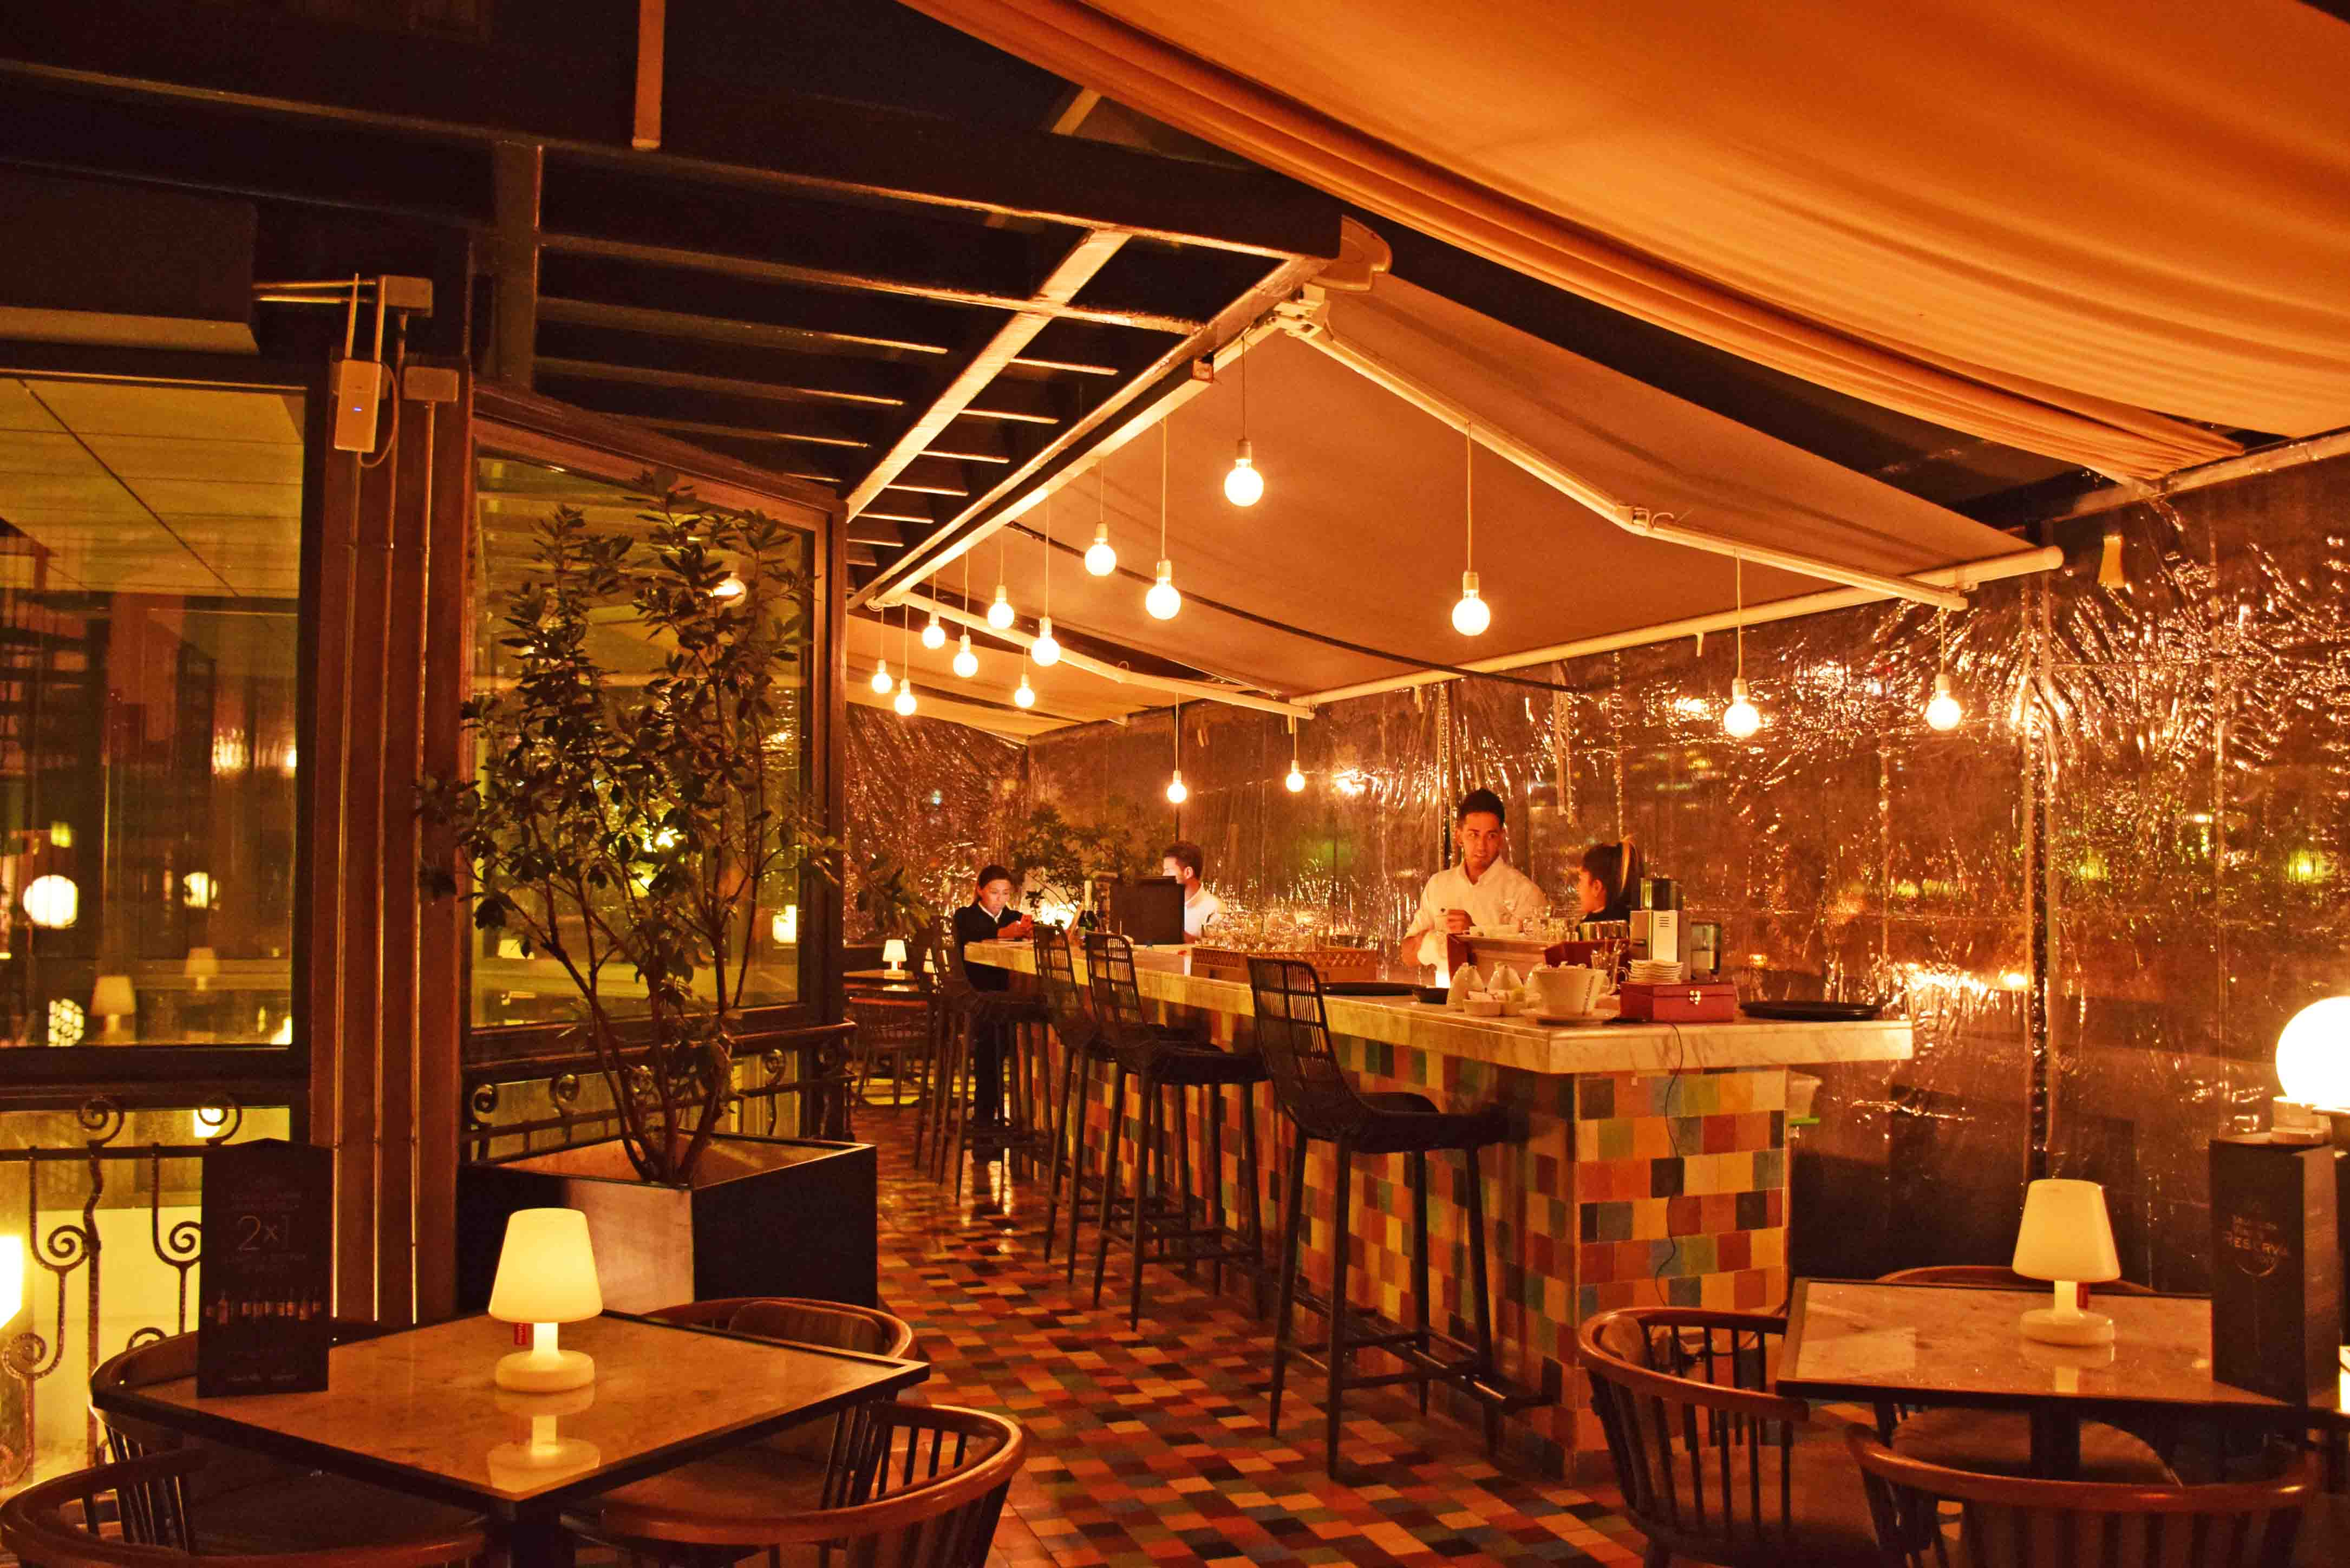 restaurantes bares em santiago chile - terraza k - lastarria